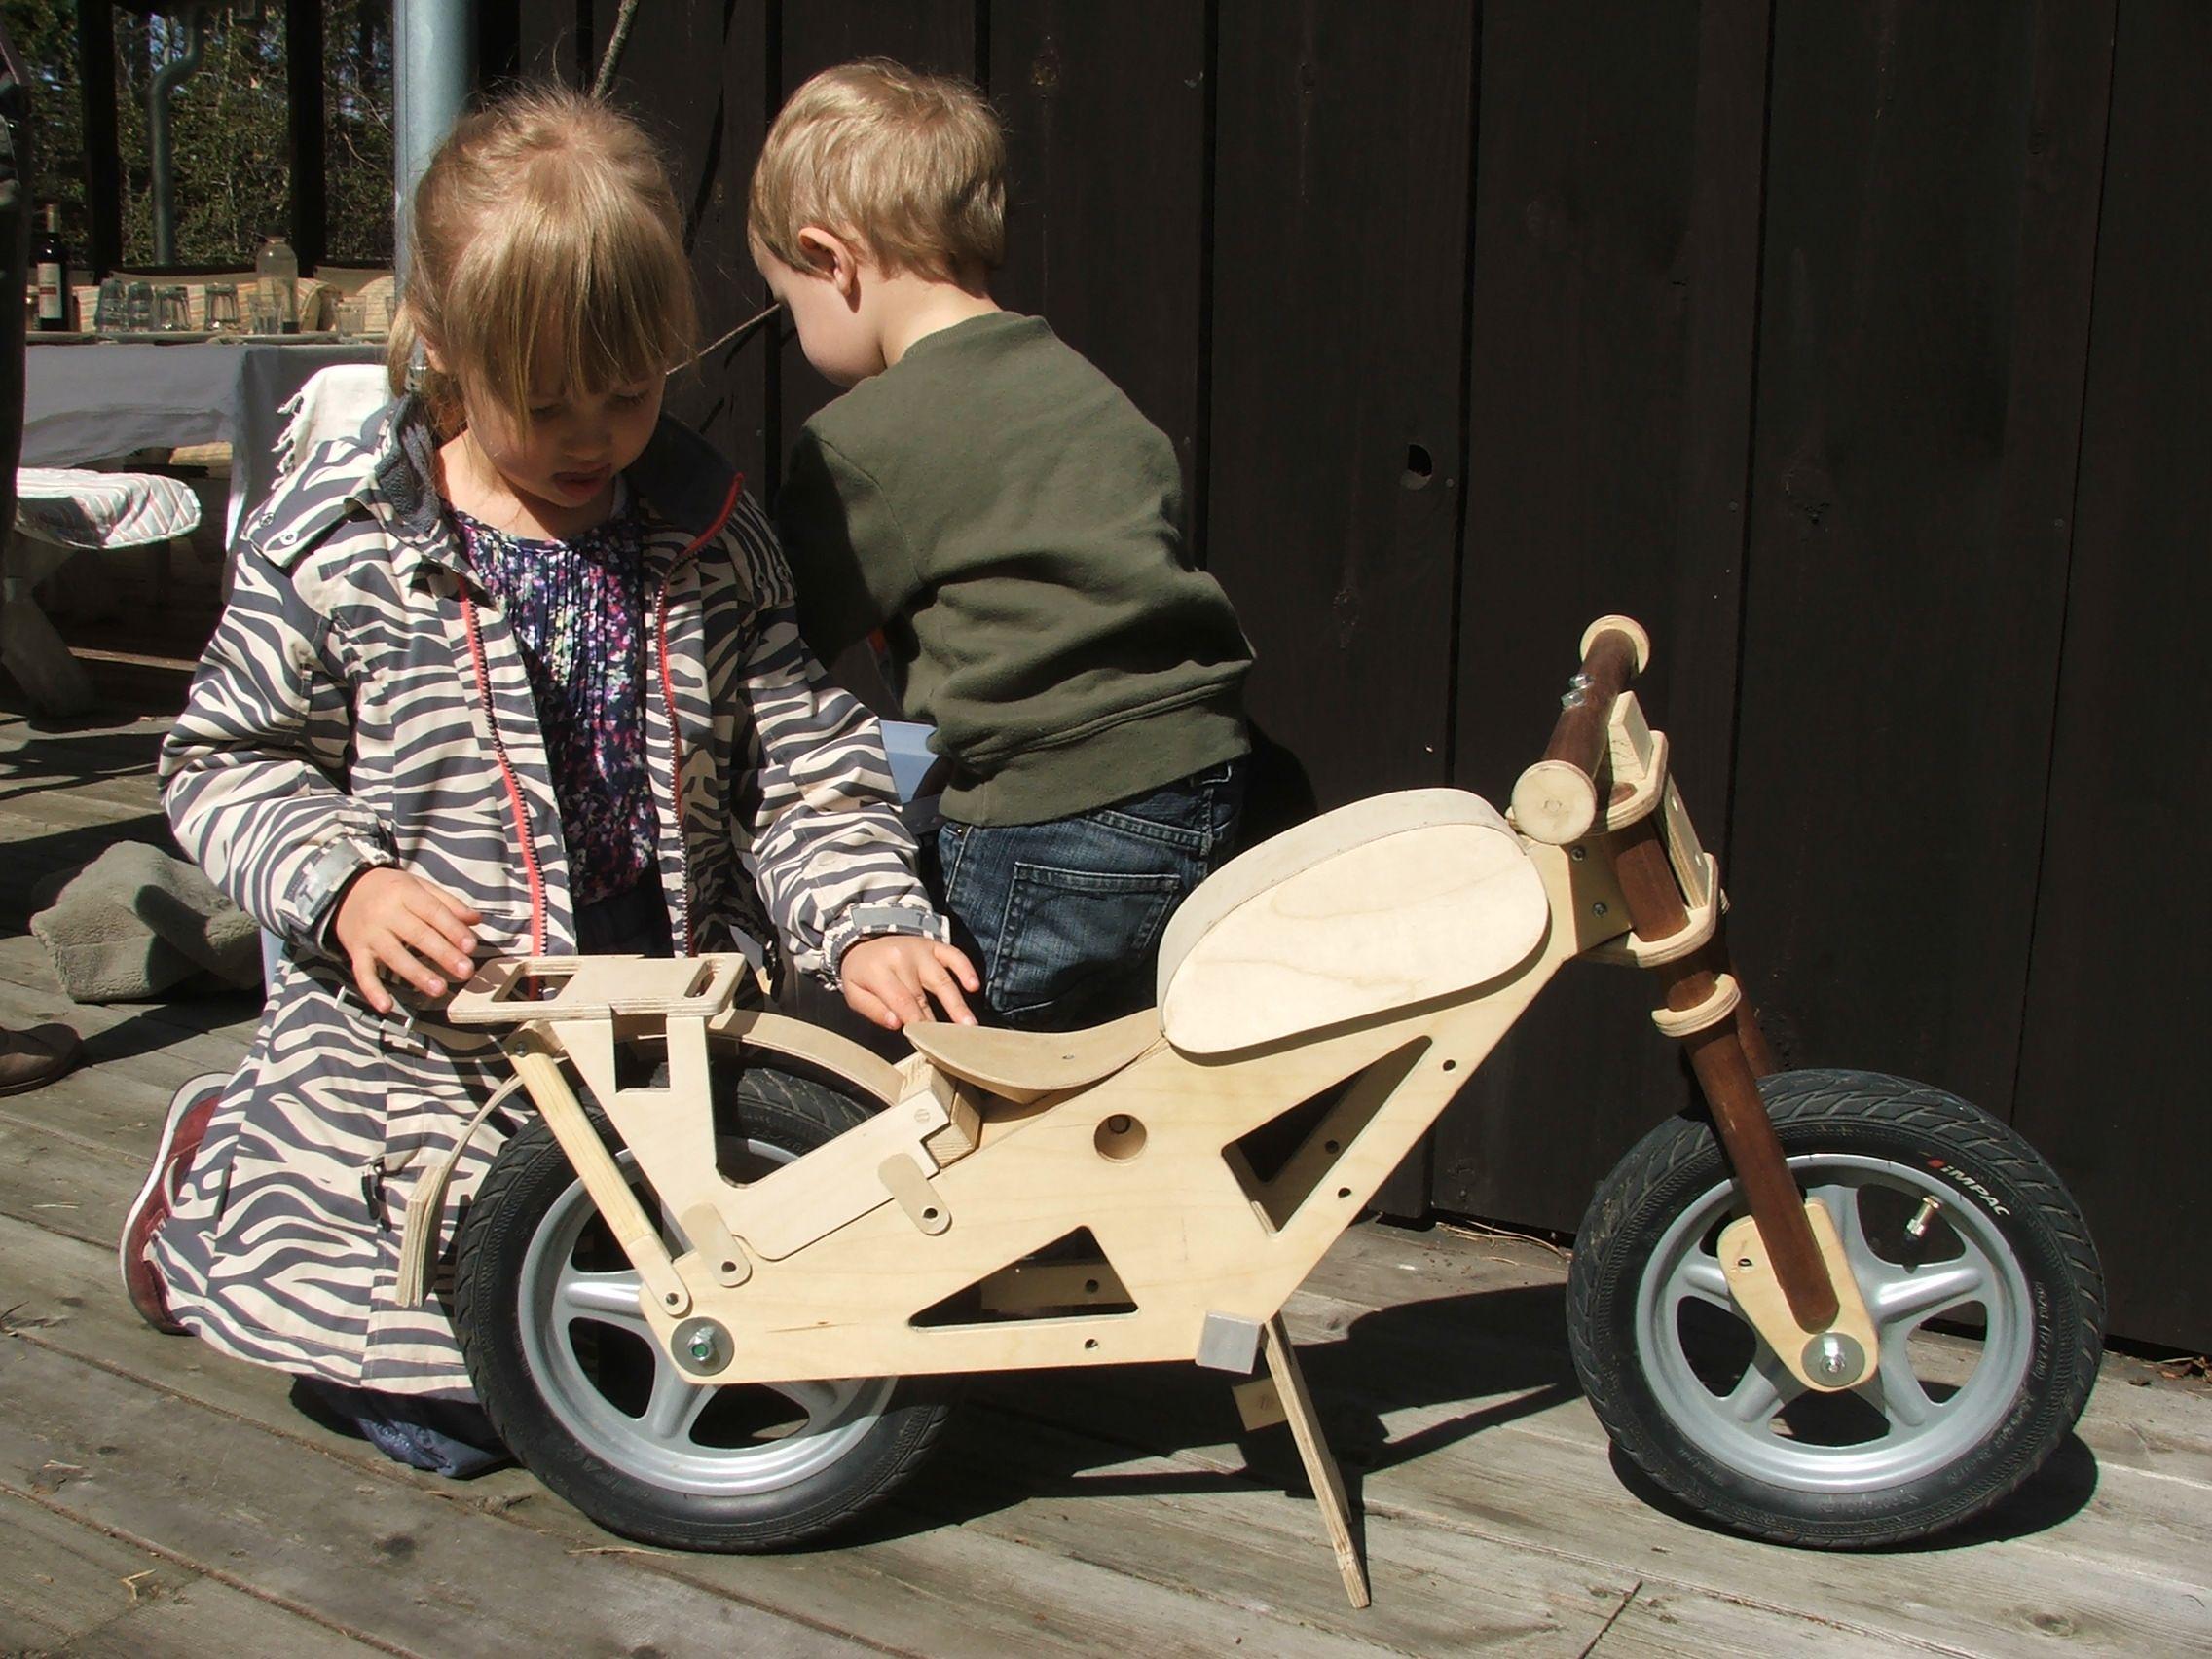 Blinkenbike Is Danish Designed Build A Balance Bike That Takes The